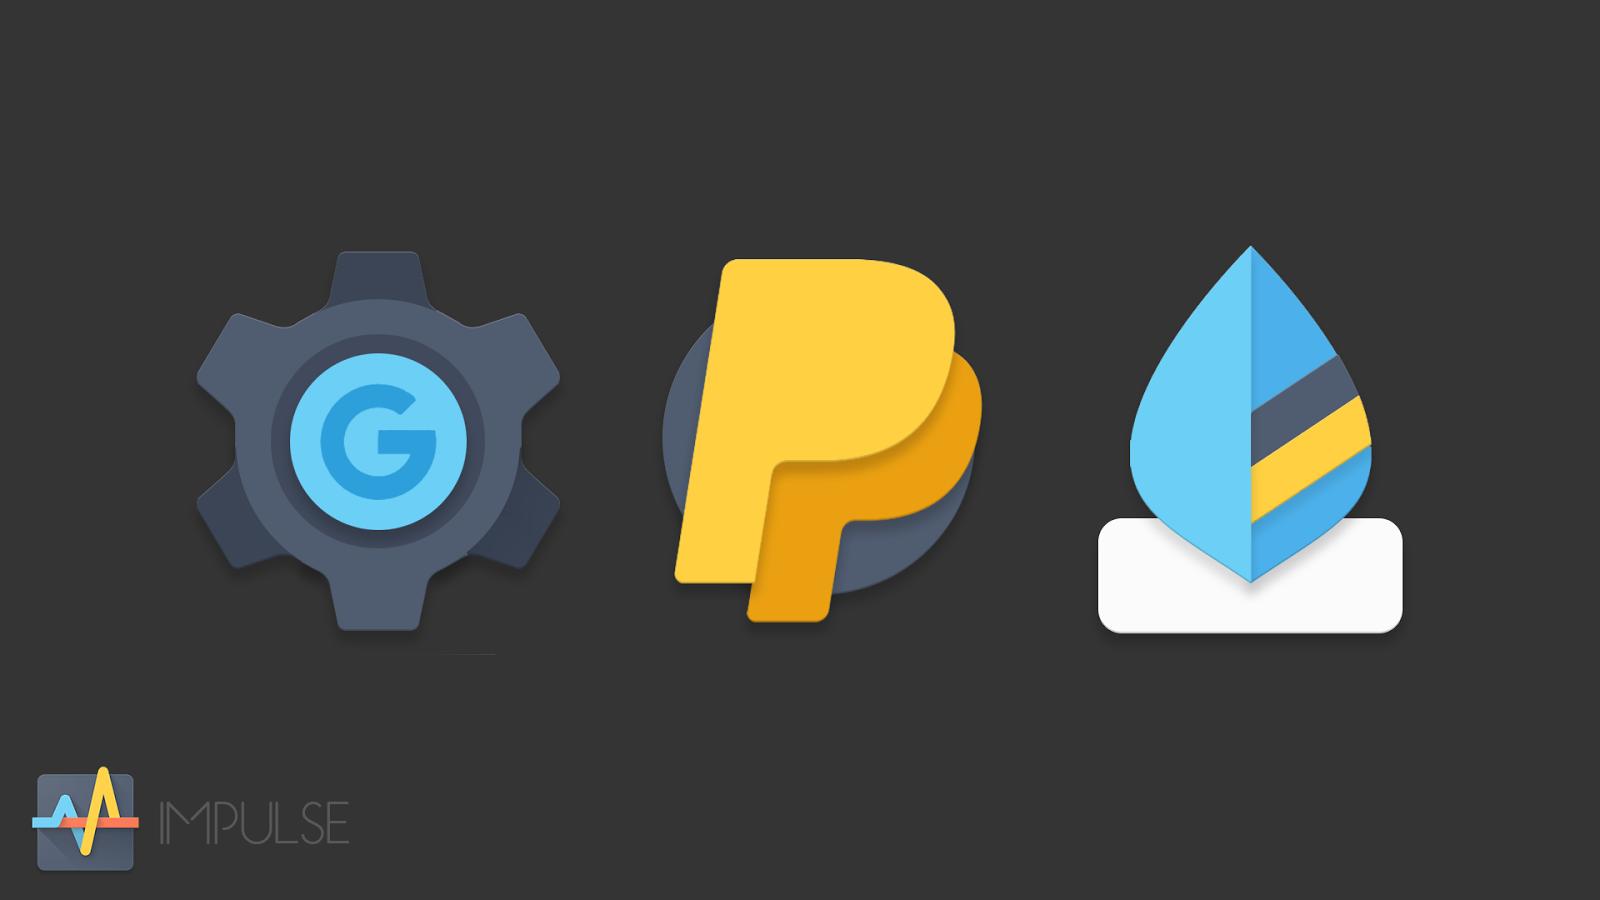 Impulse Icon Pack- tangkapan layar